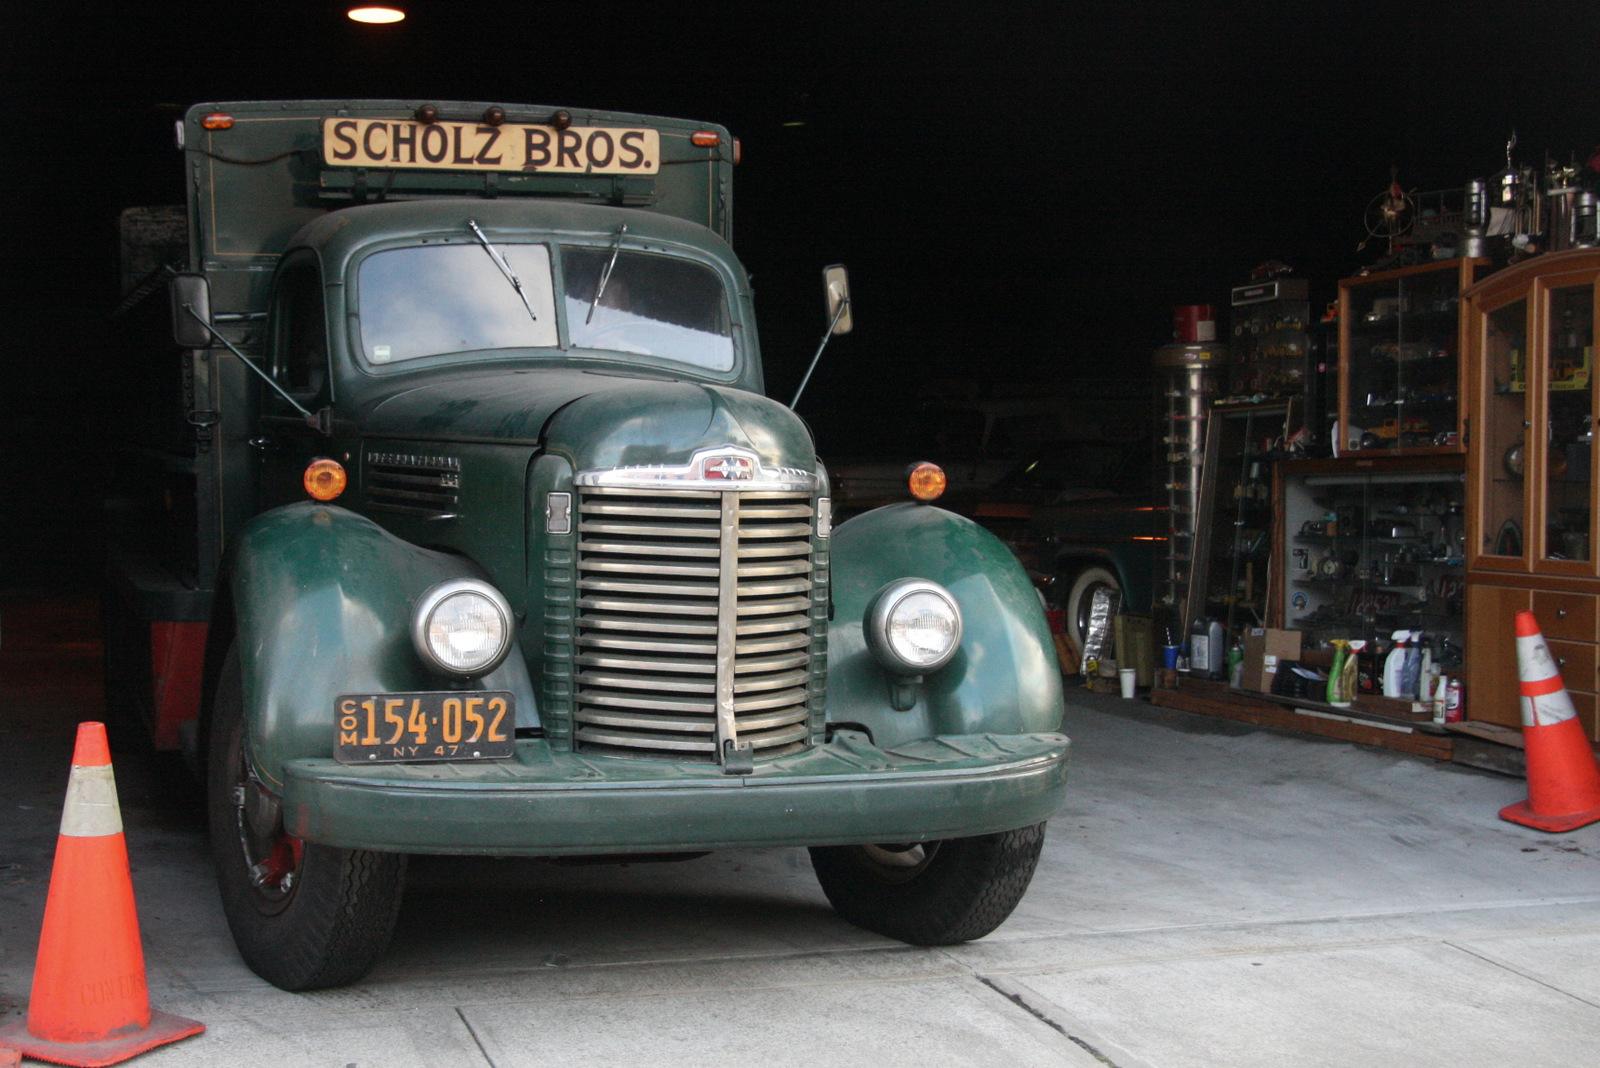 1947 International KB6 soda delivery truck